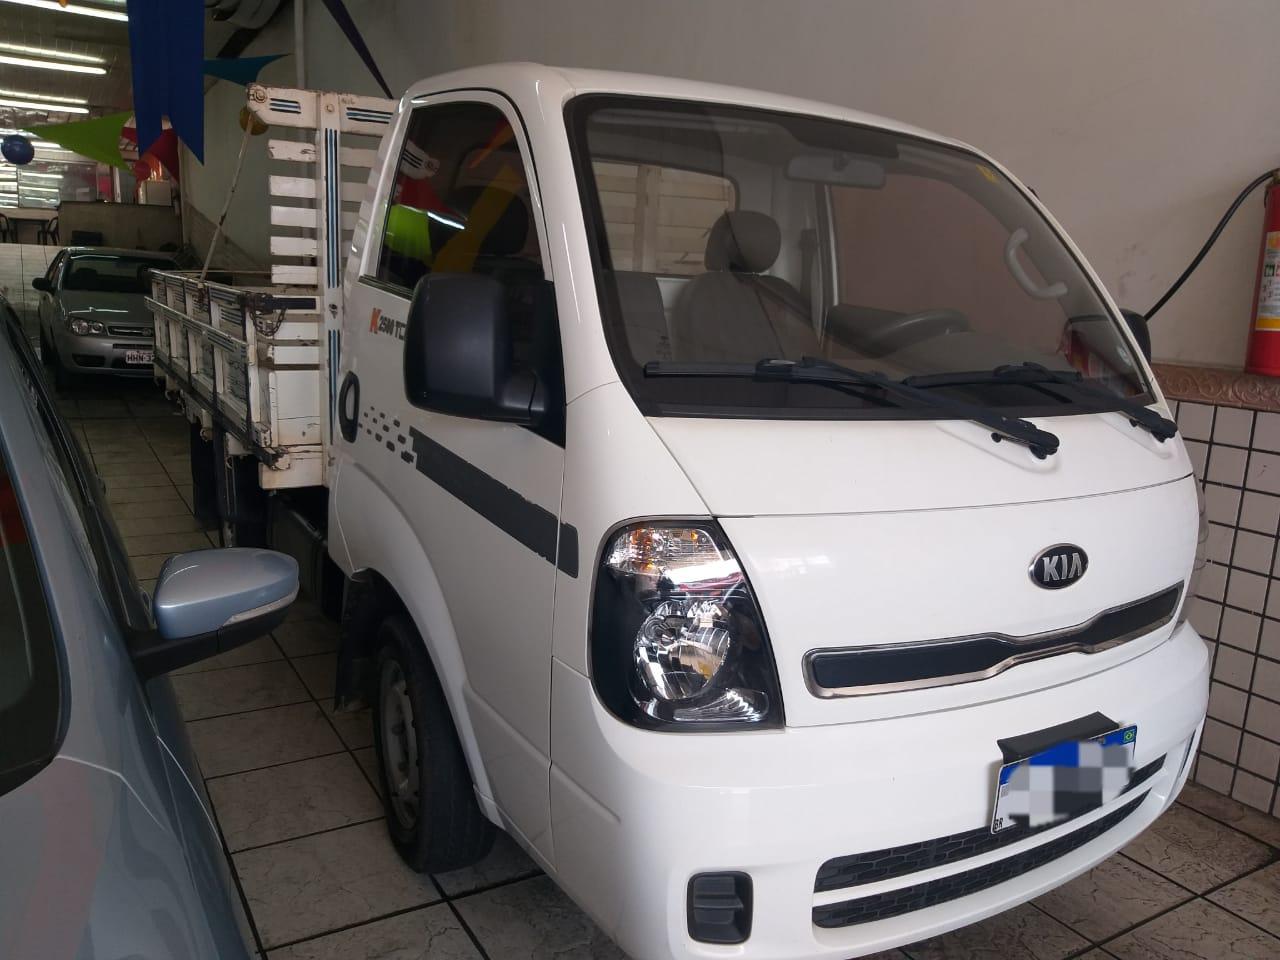 Kia bongo carroceria 2015